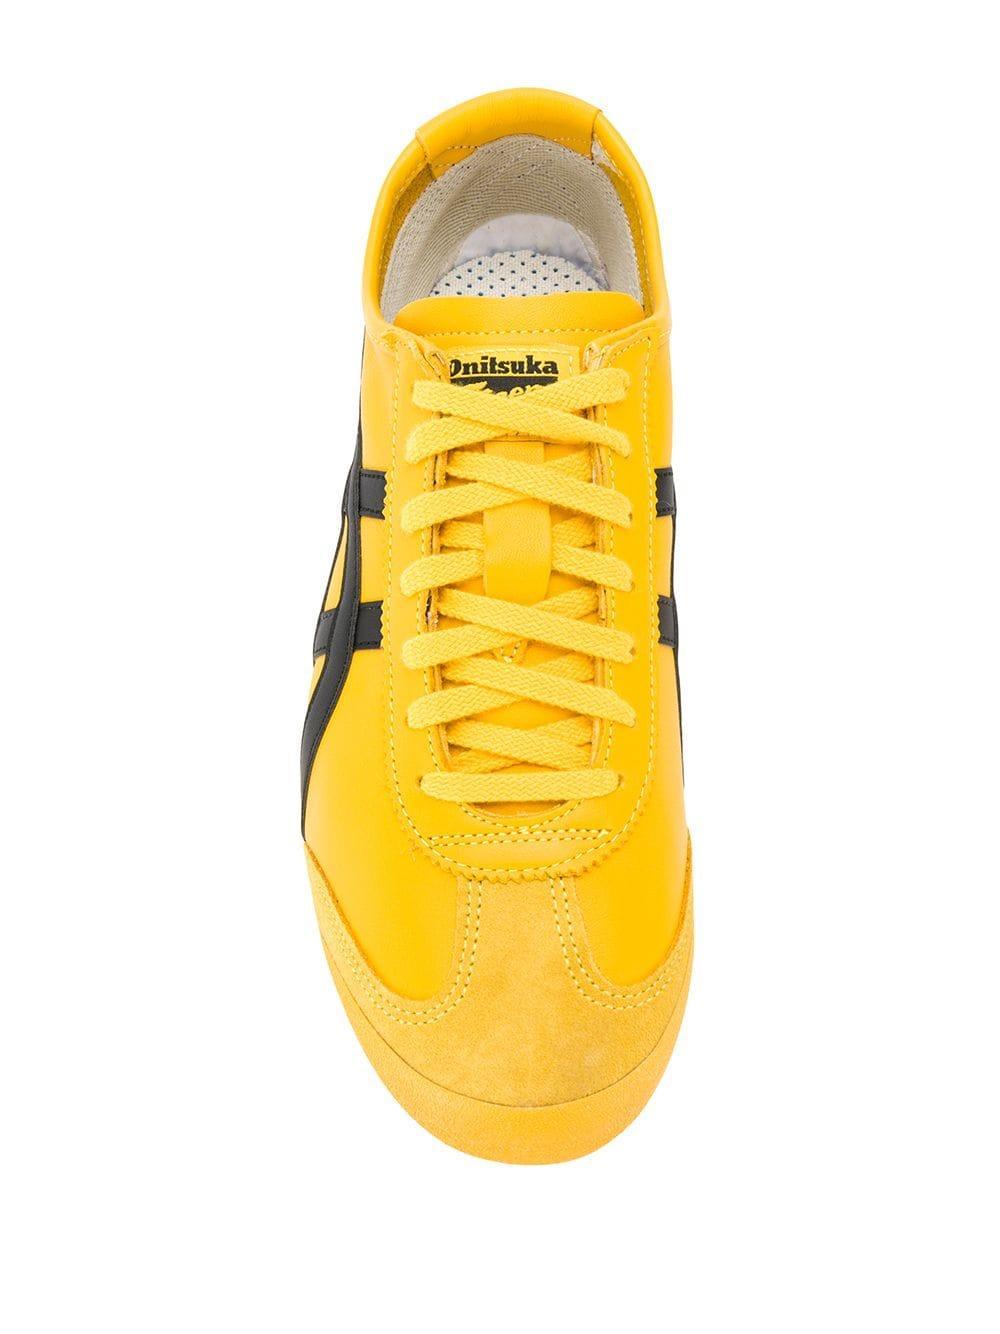 onitsuka tiger mexico 66 yellow zhavia ii precio